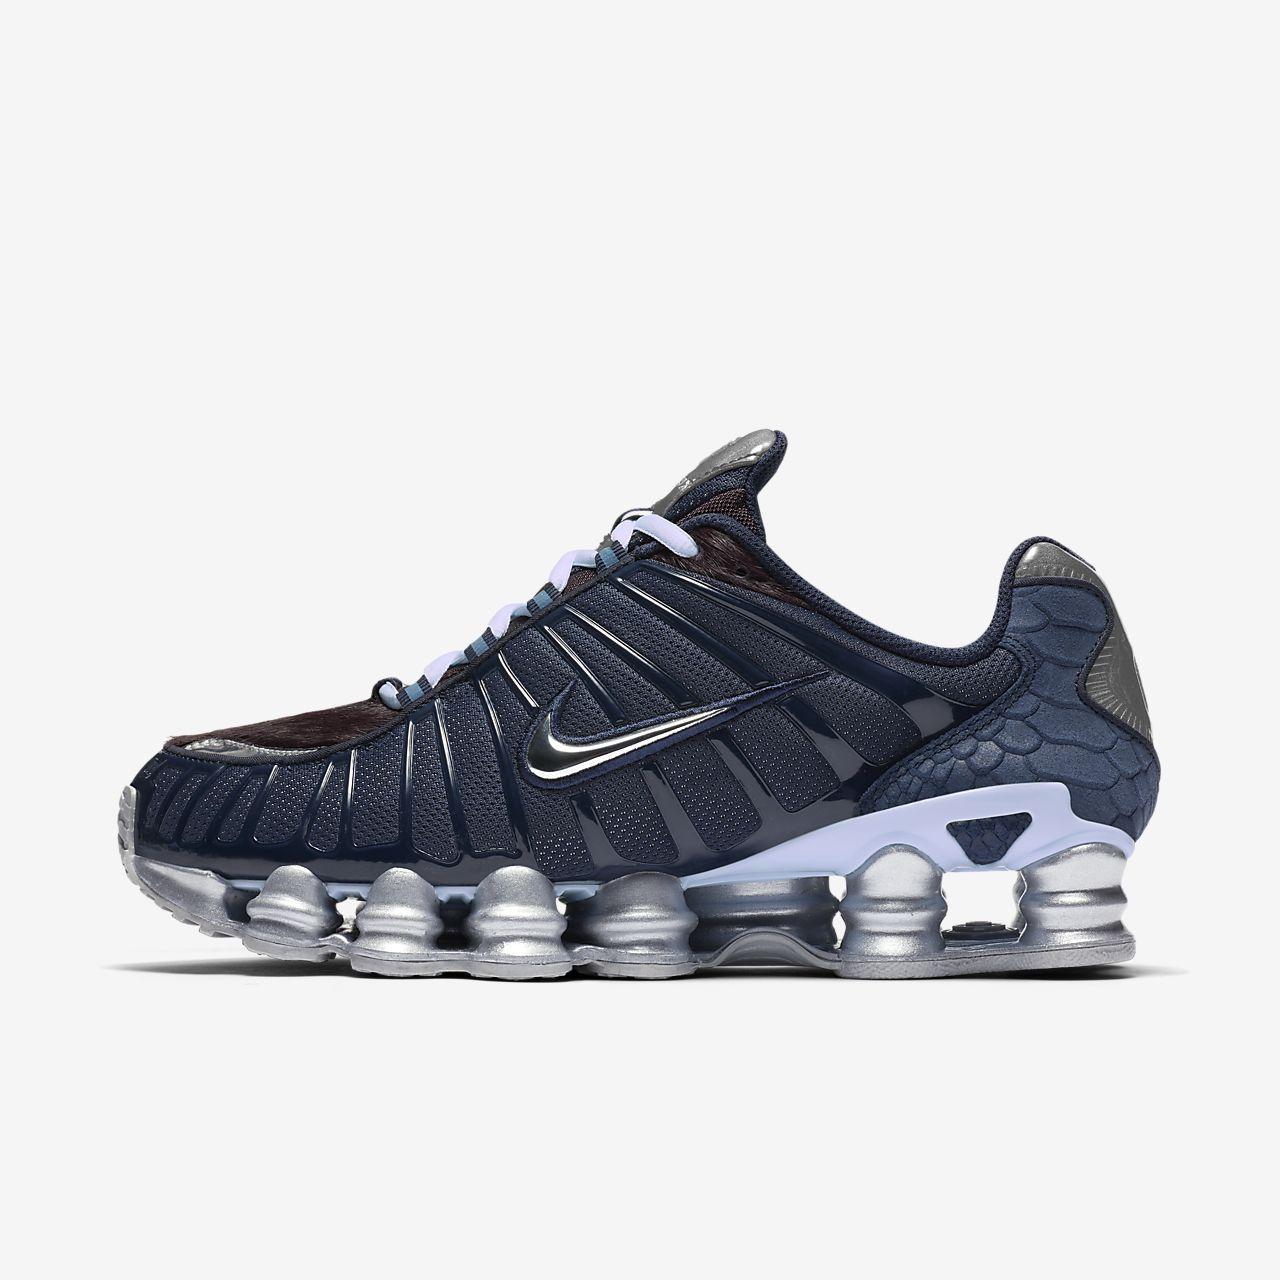 Scarpe da ginnastica da uomo Nike Shox Taglia 46 | Acquisti